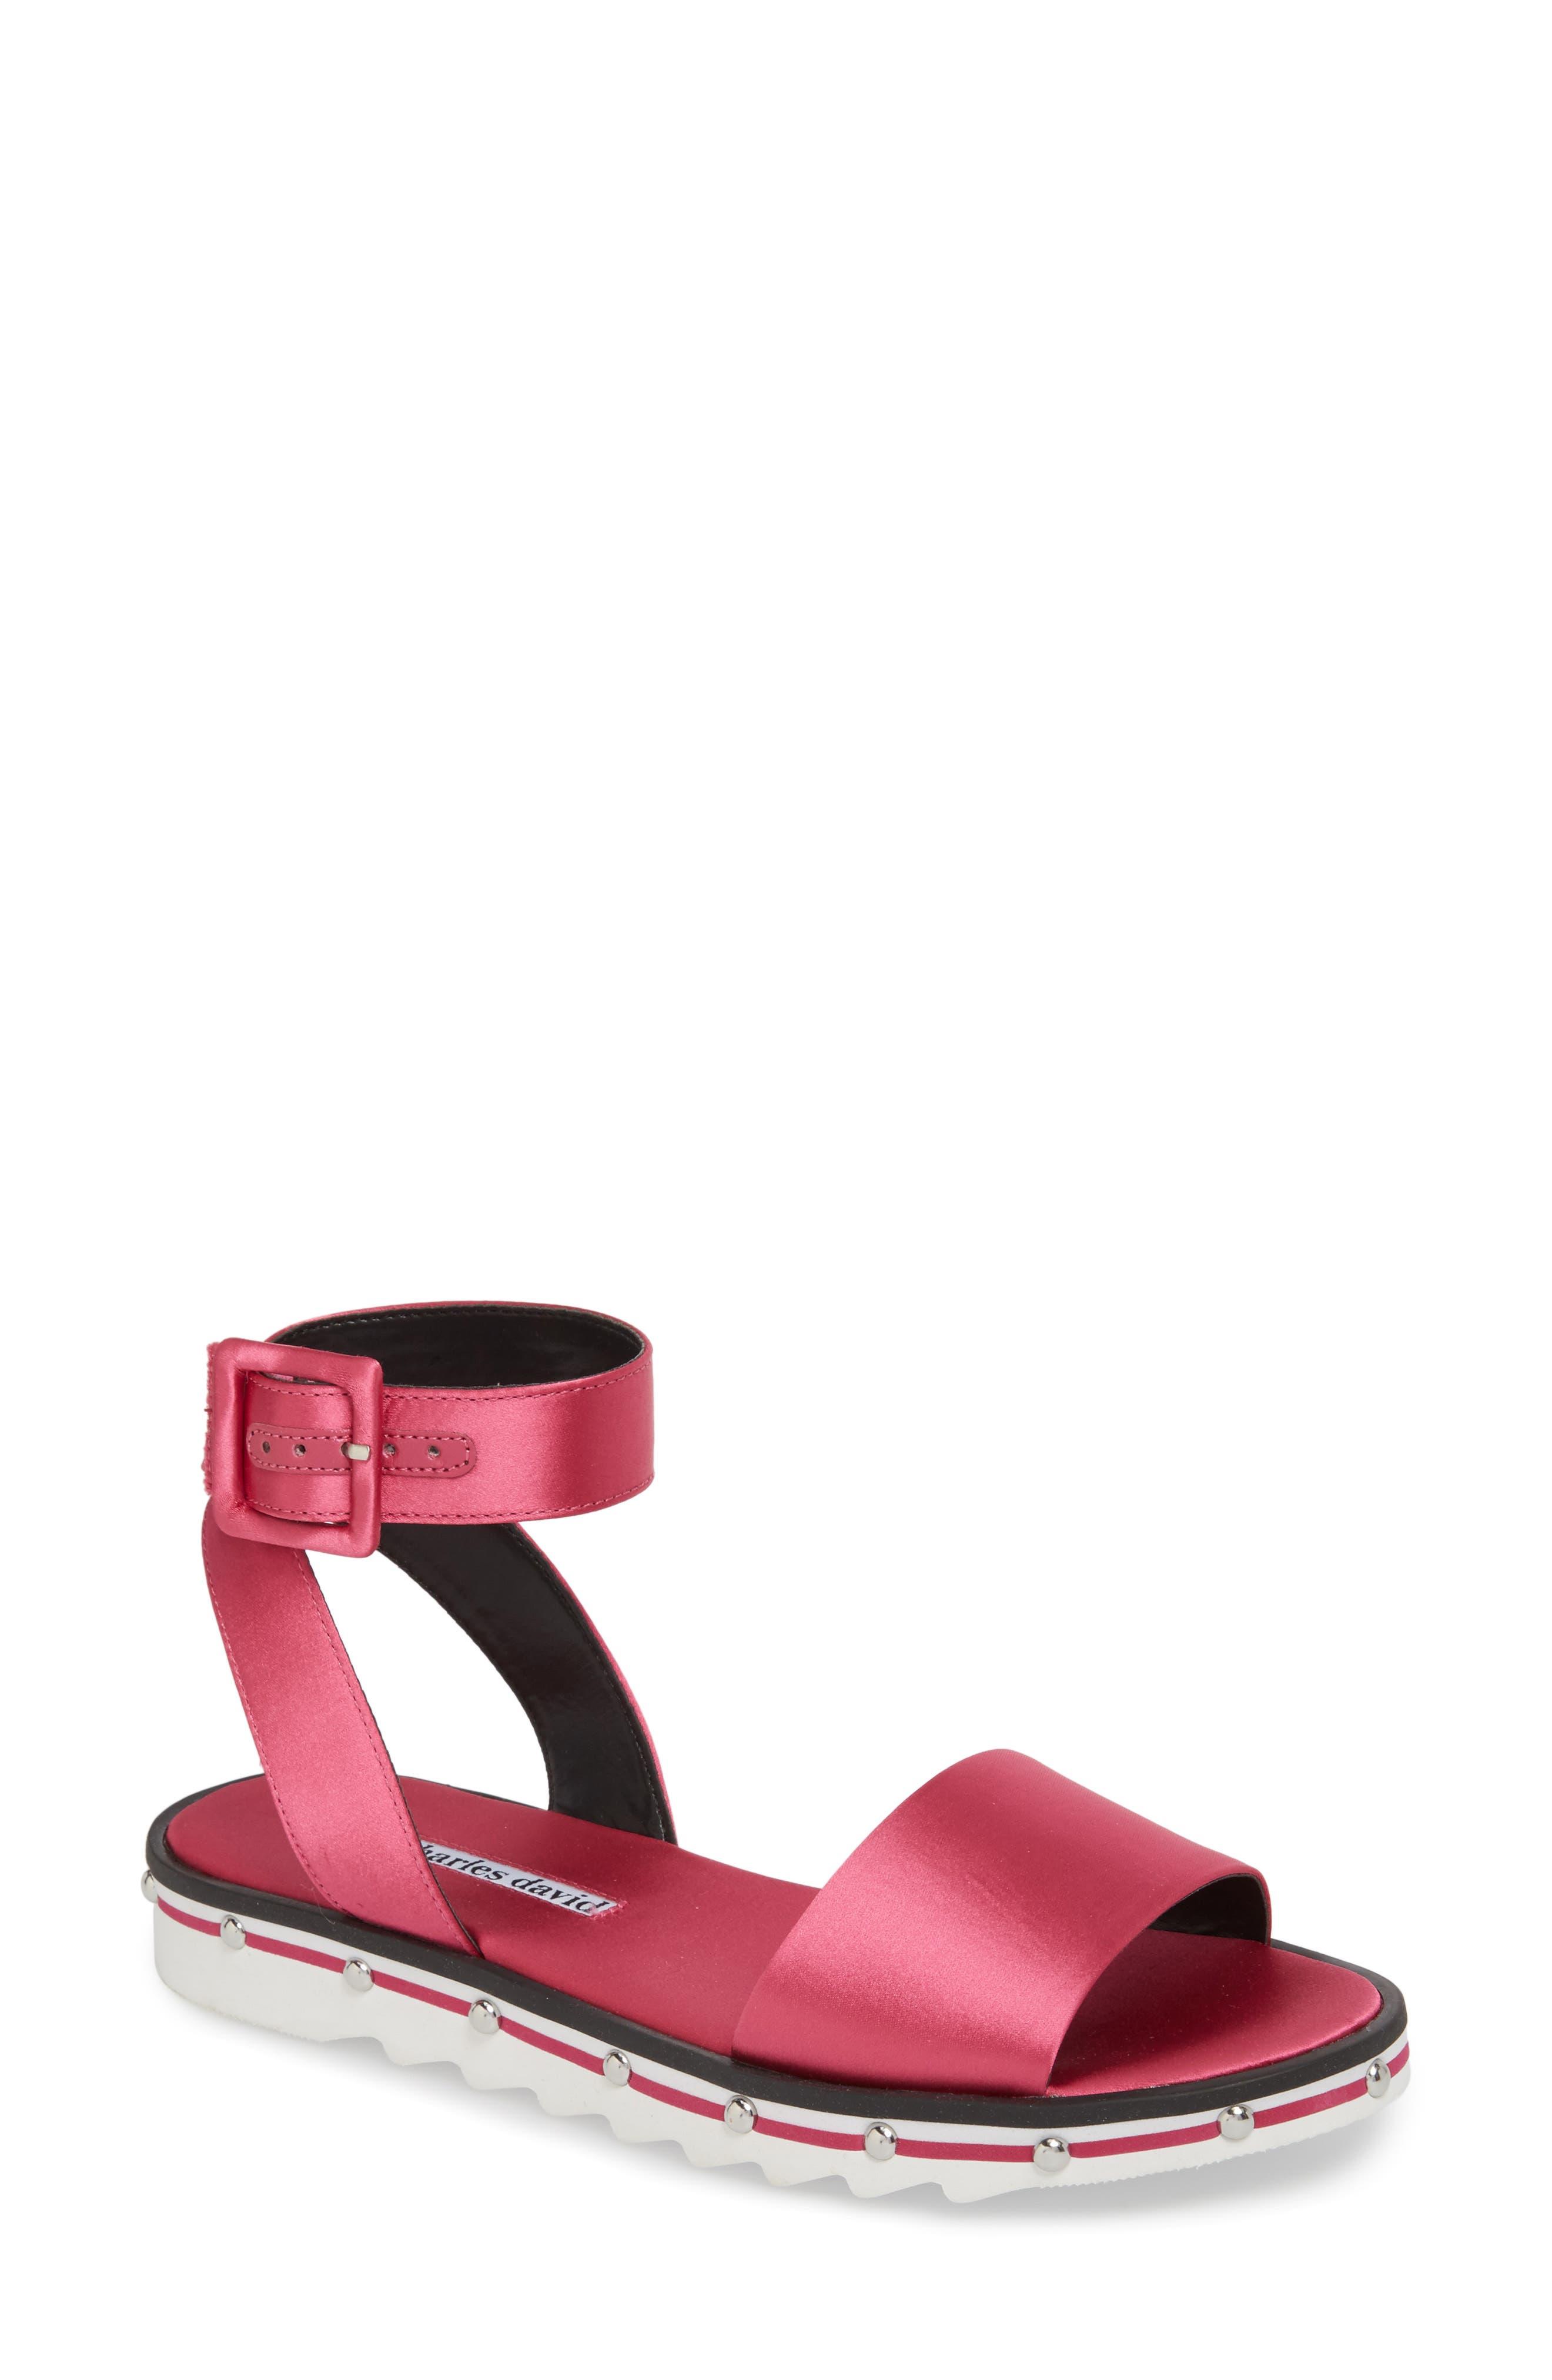 Charles David Shimmy Sandal, Pink